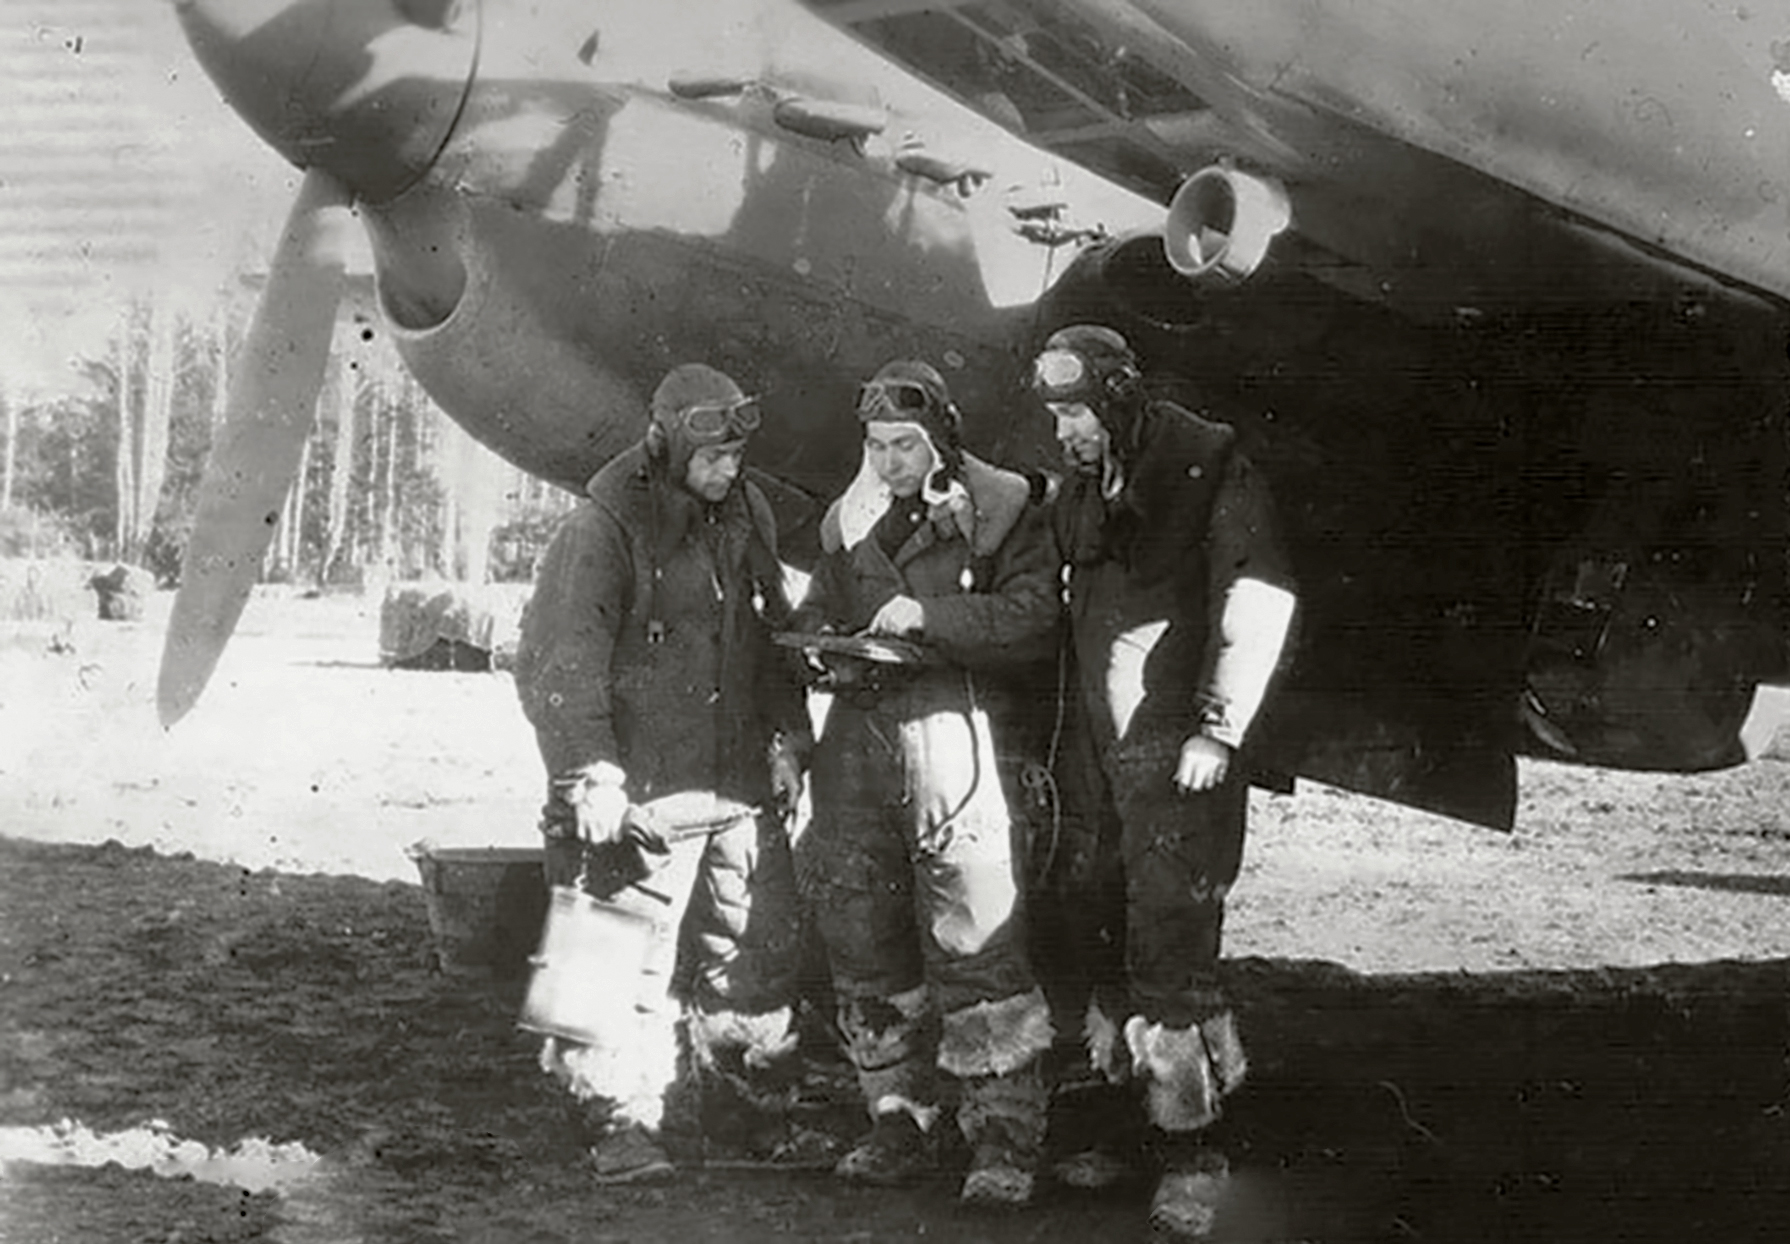 Aircrew Soviet 11ORAP with AI Moskalenko nav,AP Volko pilot and VG Glazkov radio in Feb 1945 01